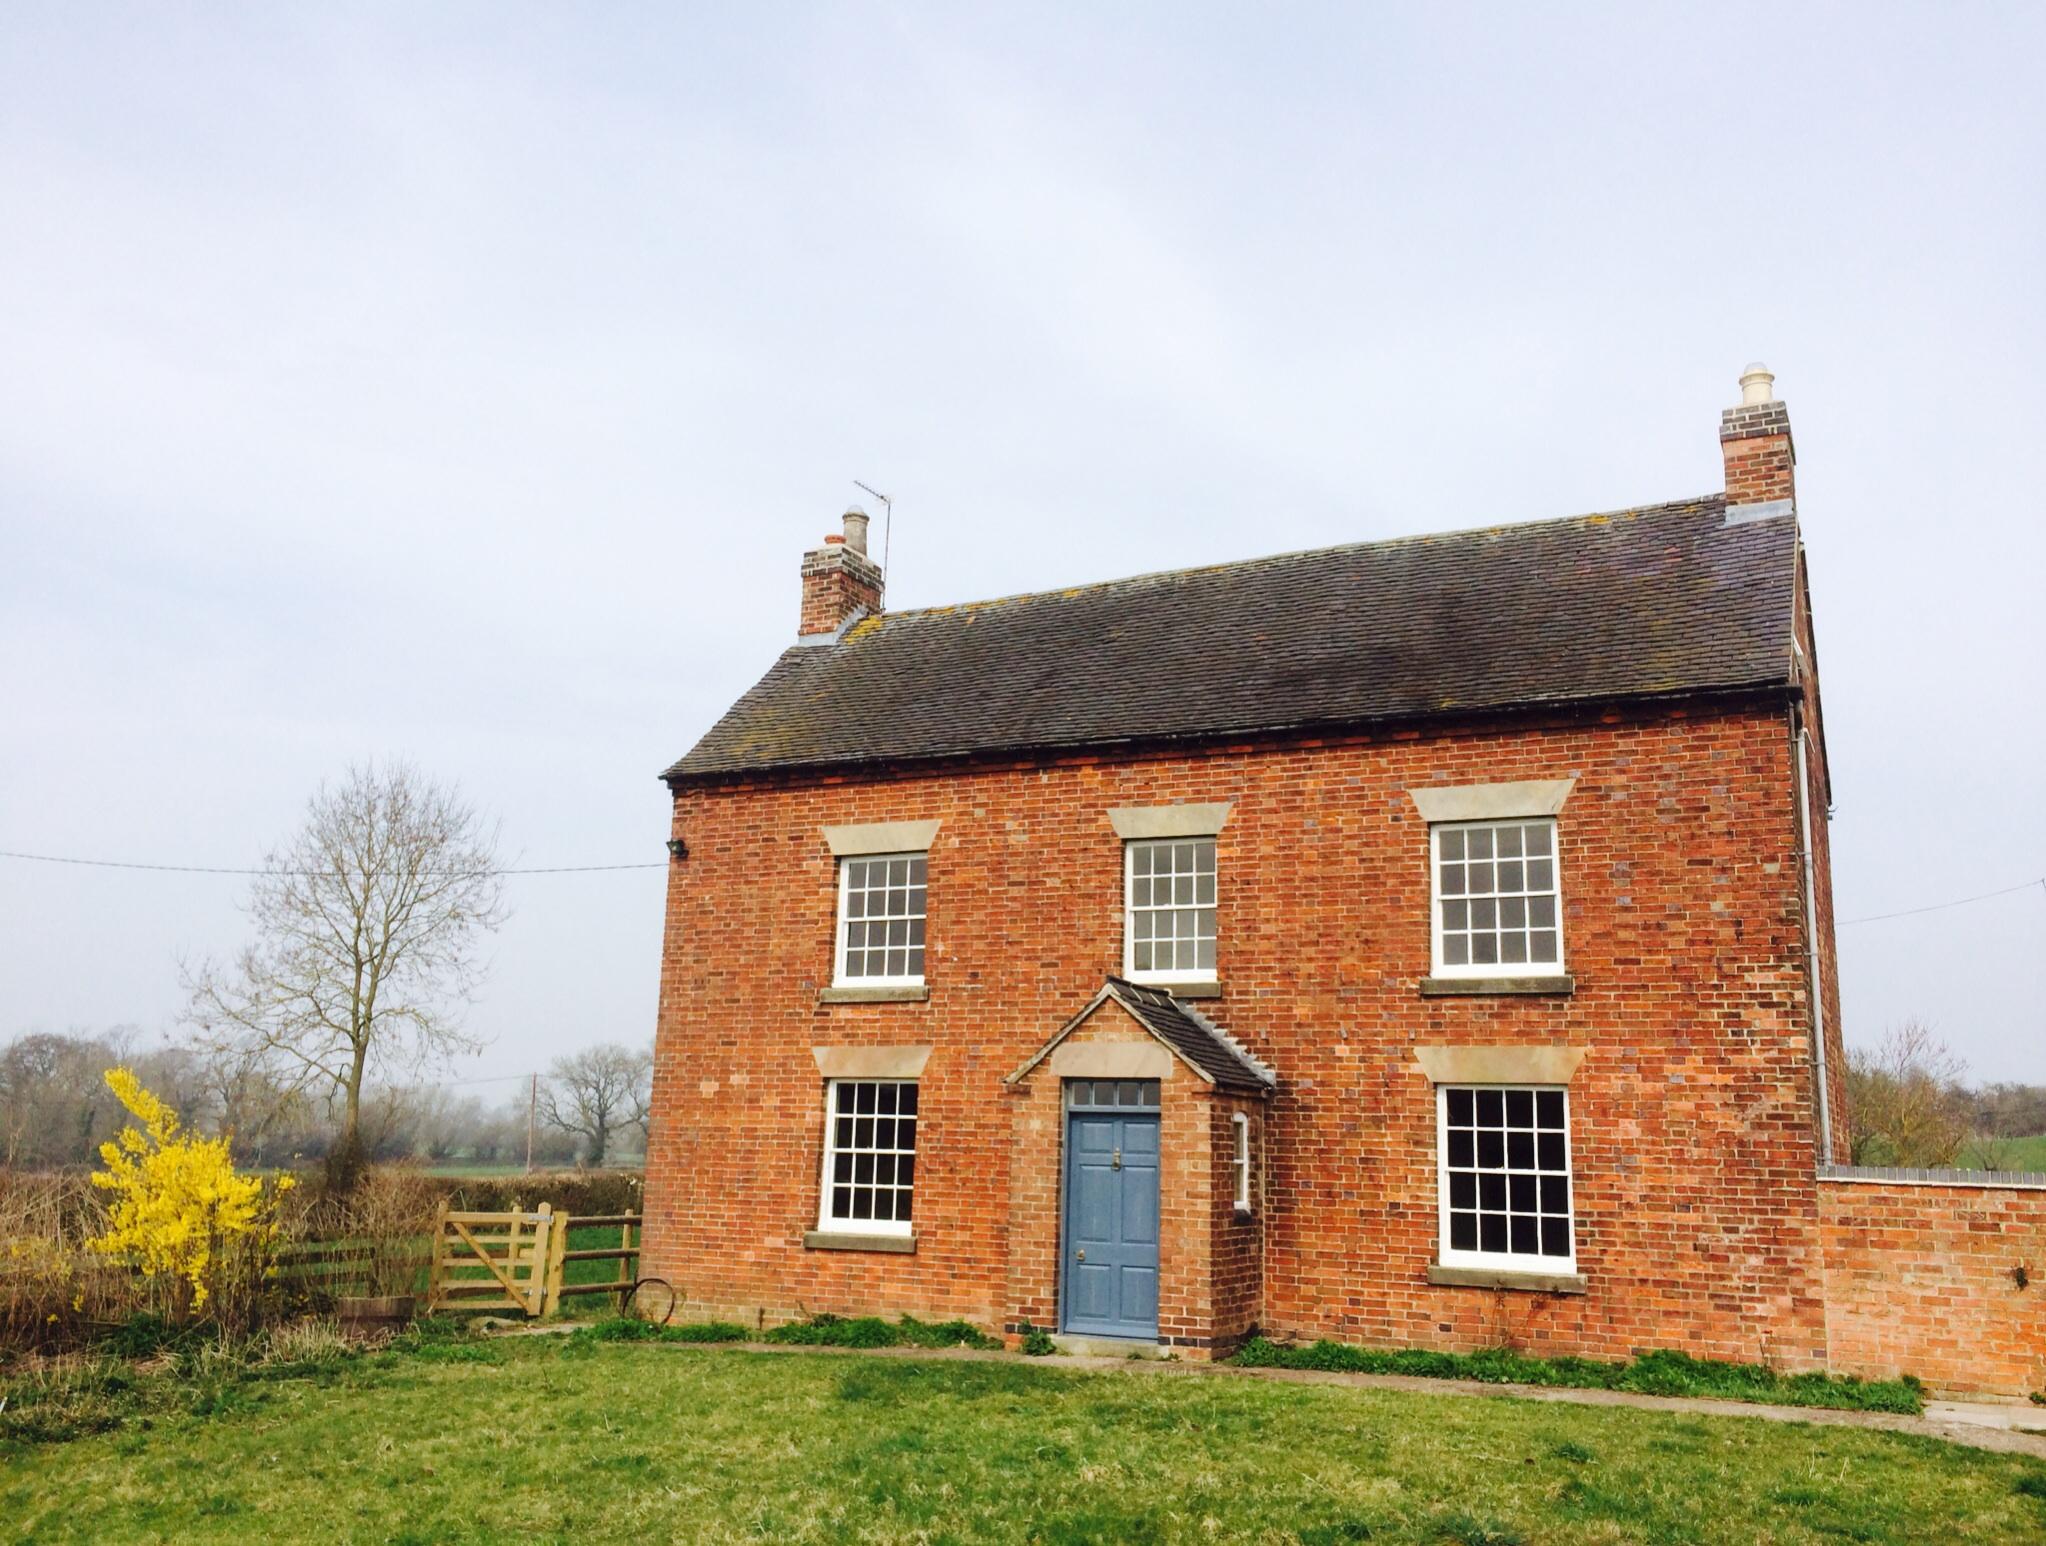 Hardley Hill Farm